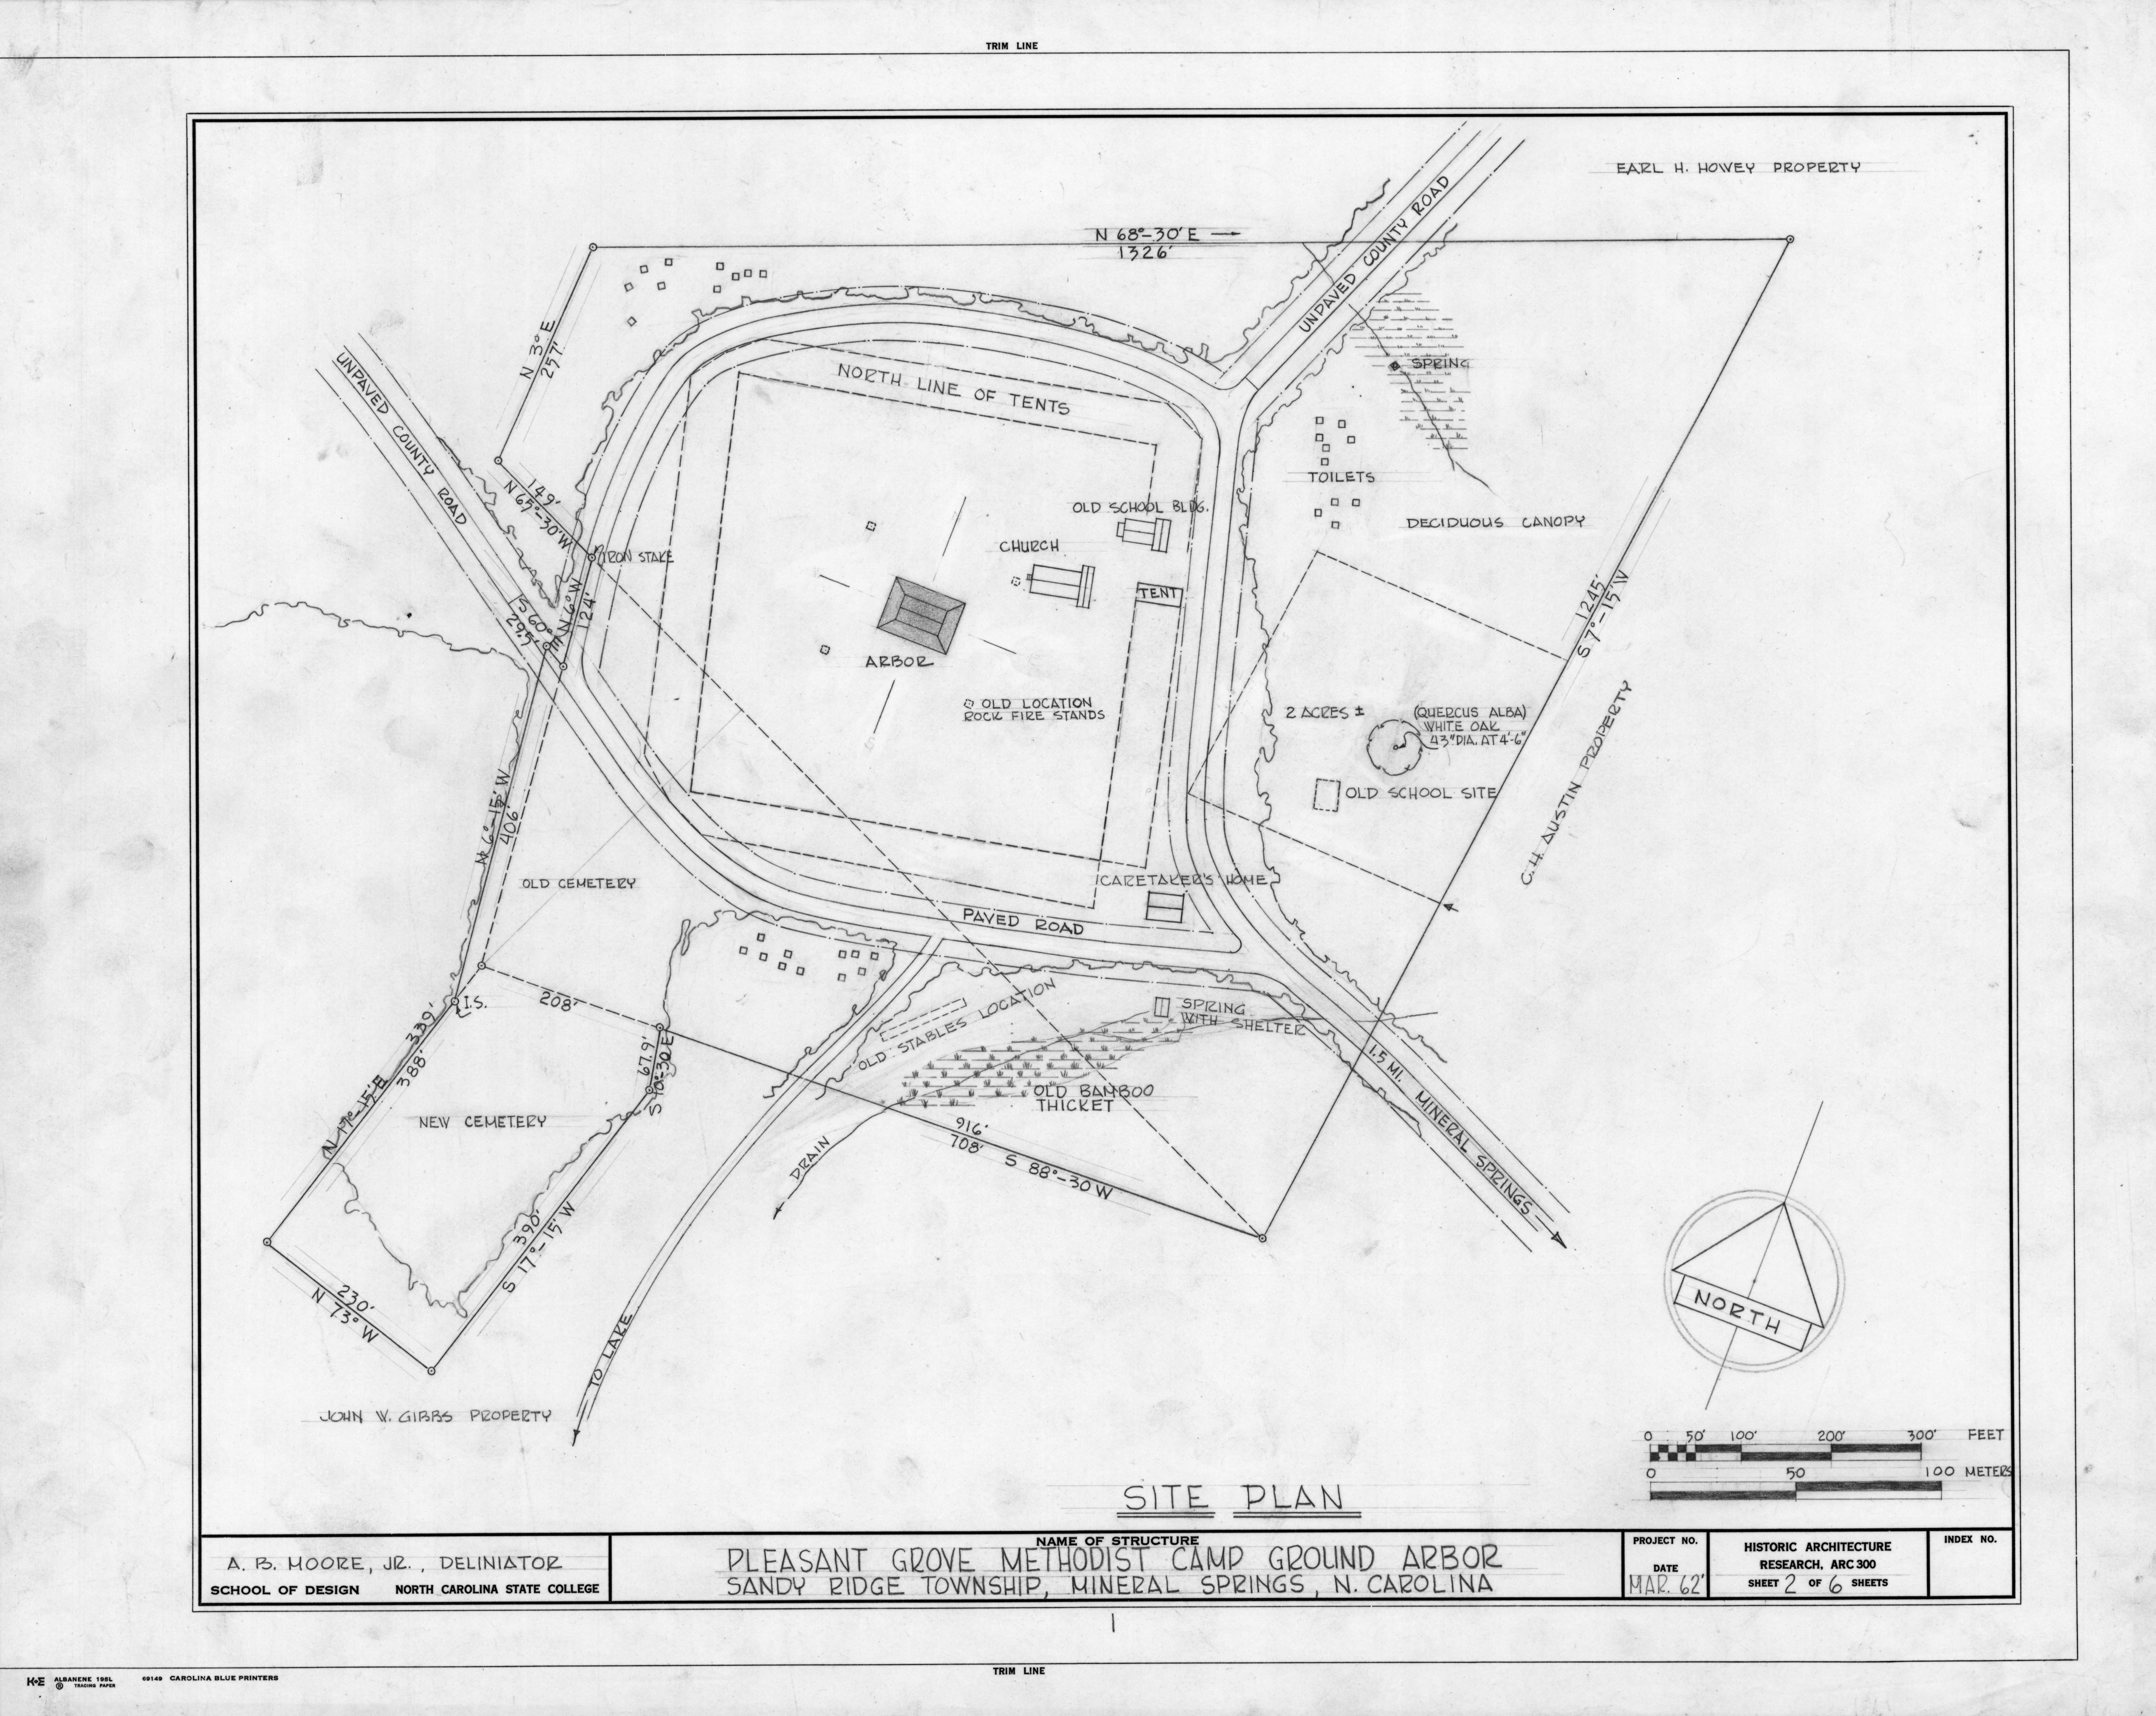 Site plan, Pleasant Grove Camp Meeting Ground, Union